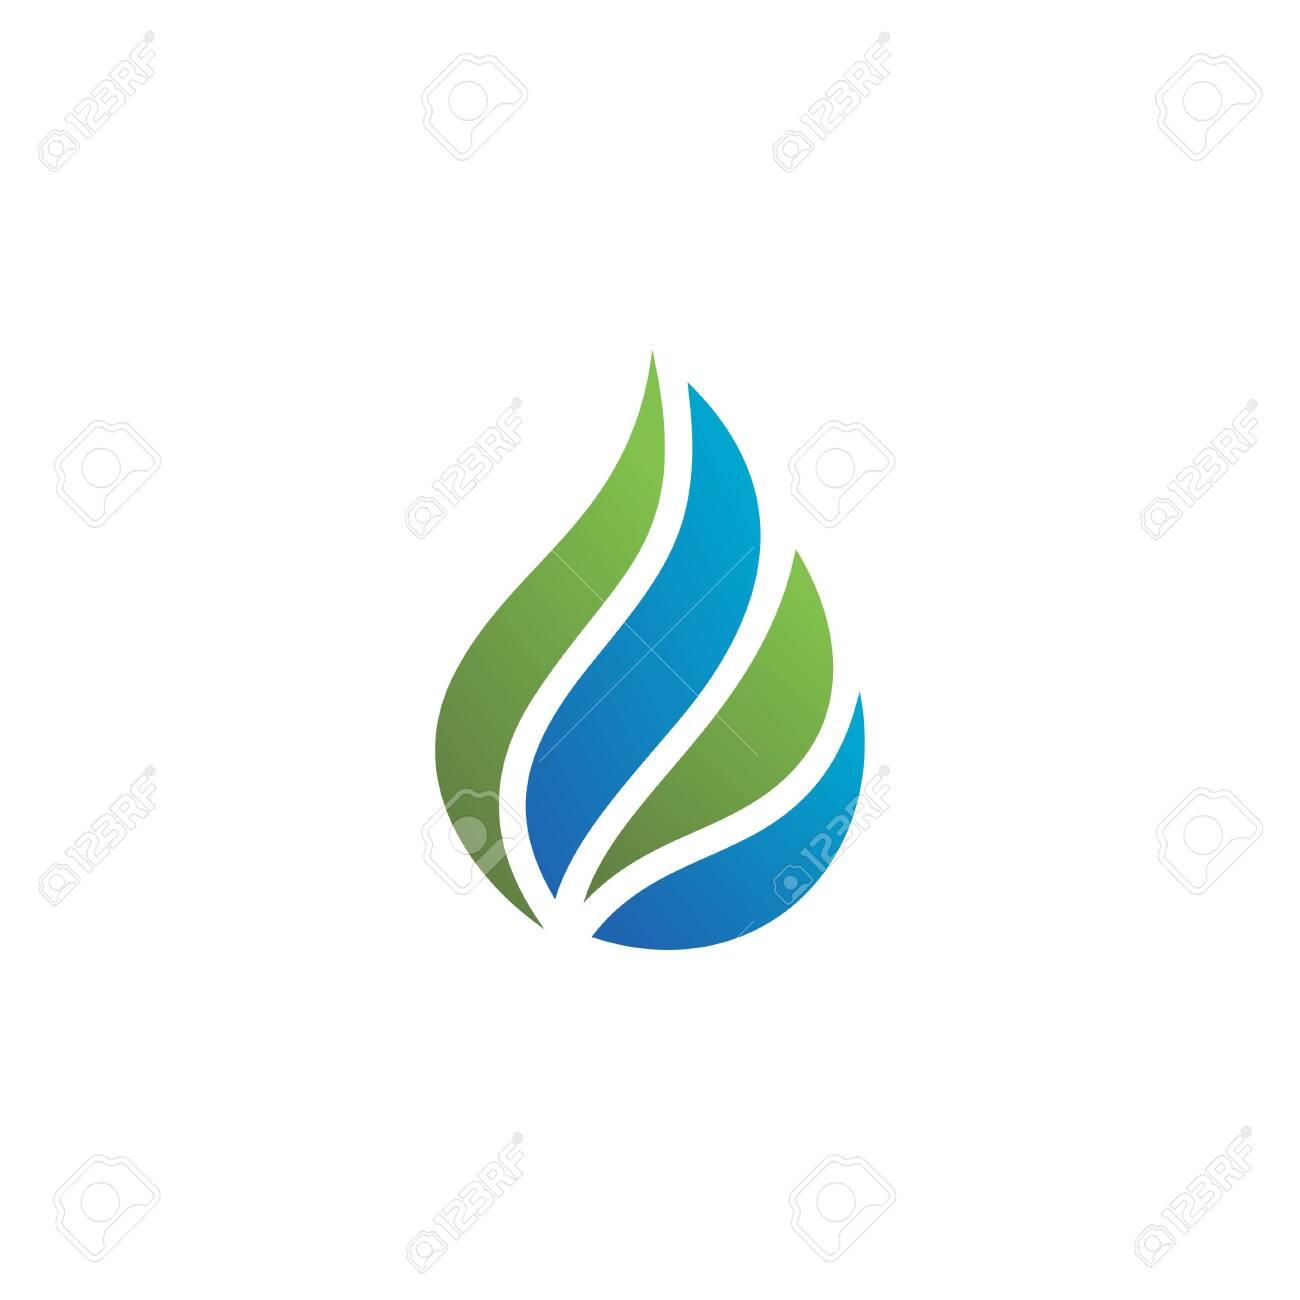 Water drop Logo Template vector illustration design - 143872727